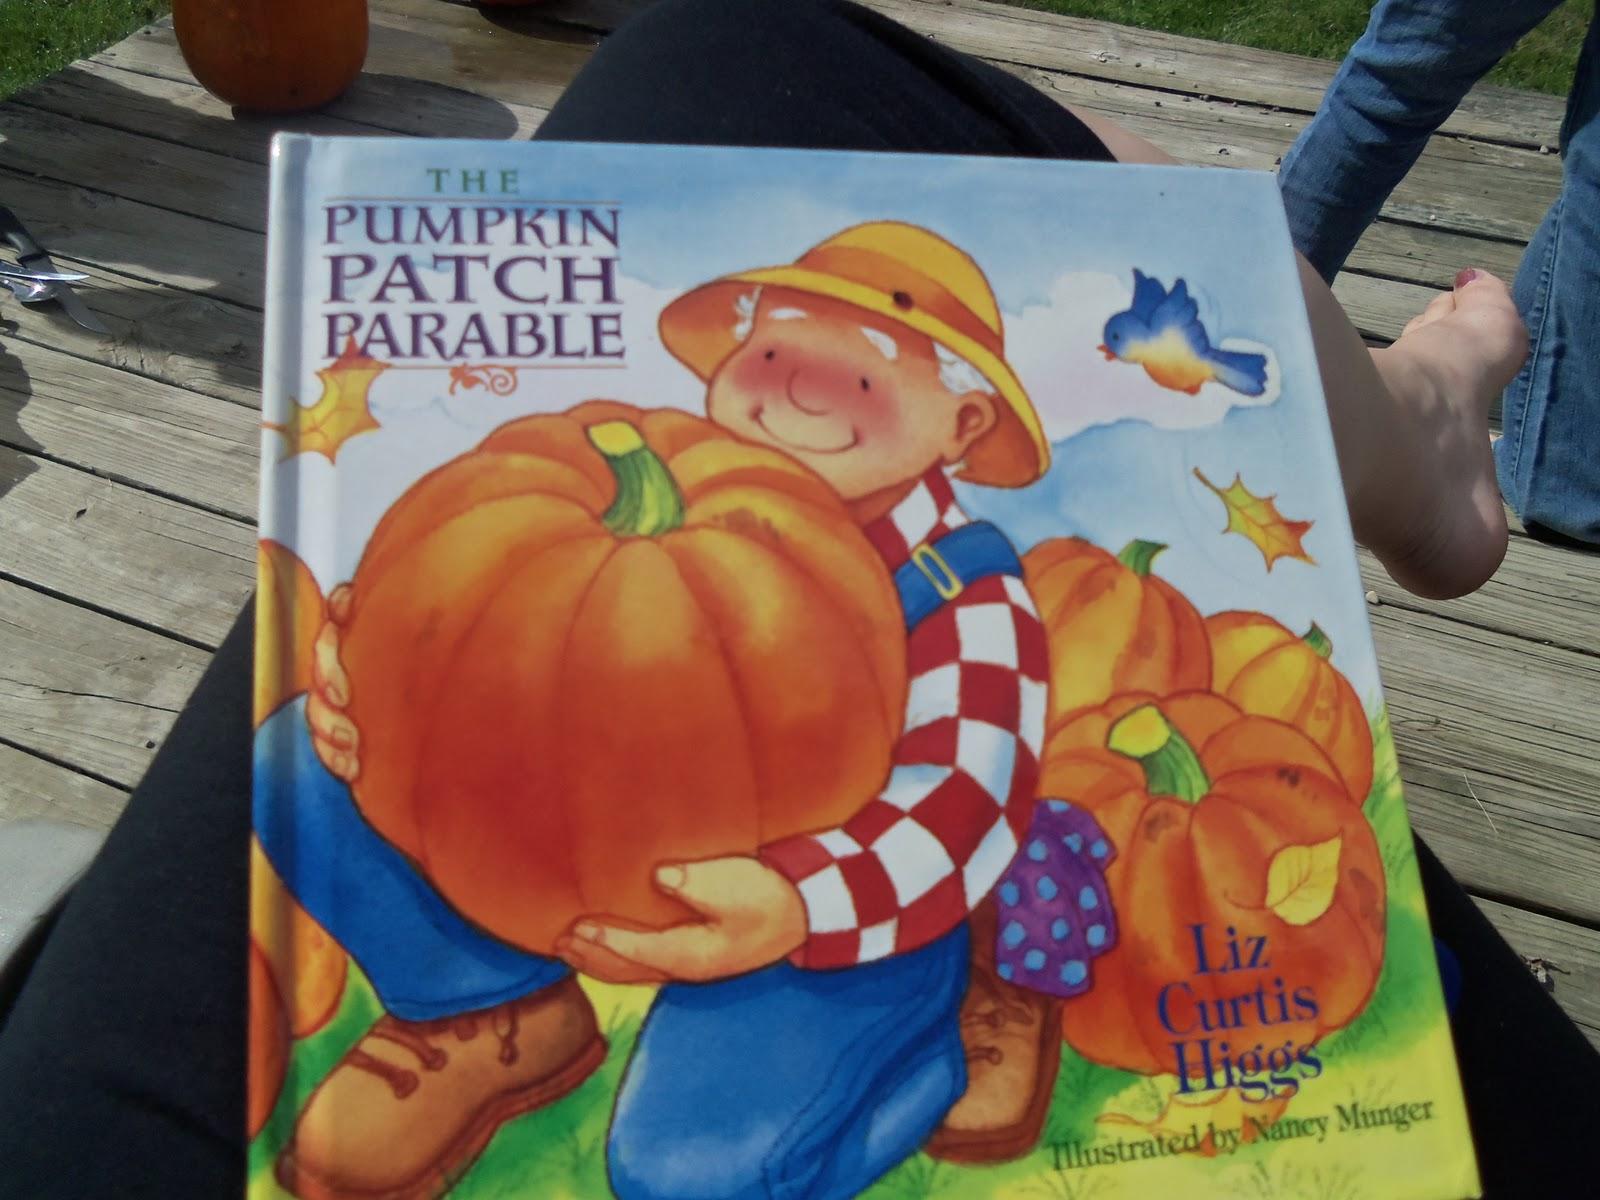 popular children's books, pumpkin patch